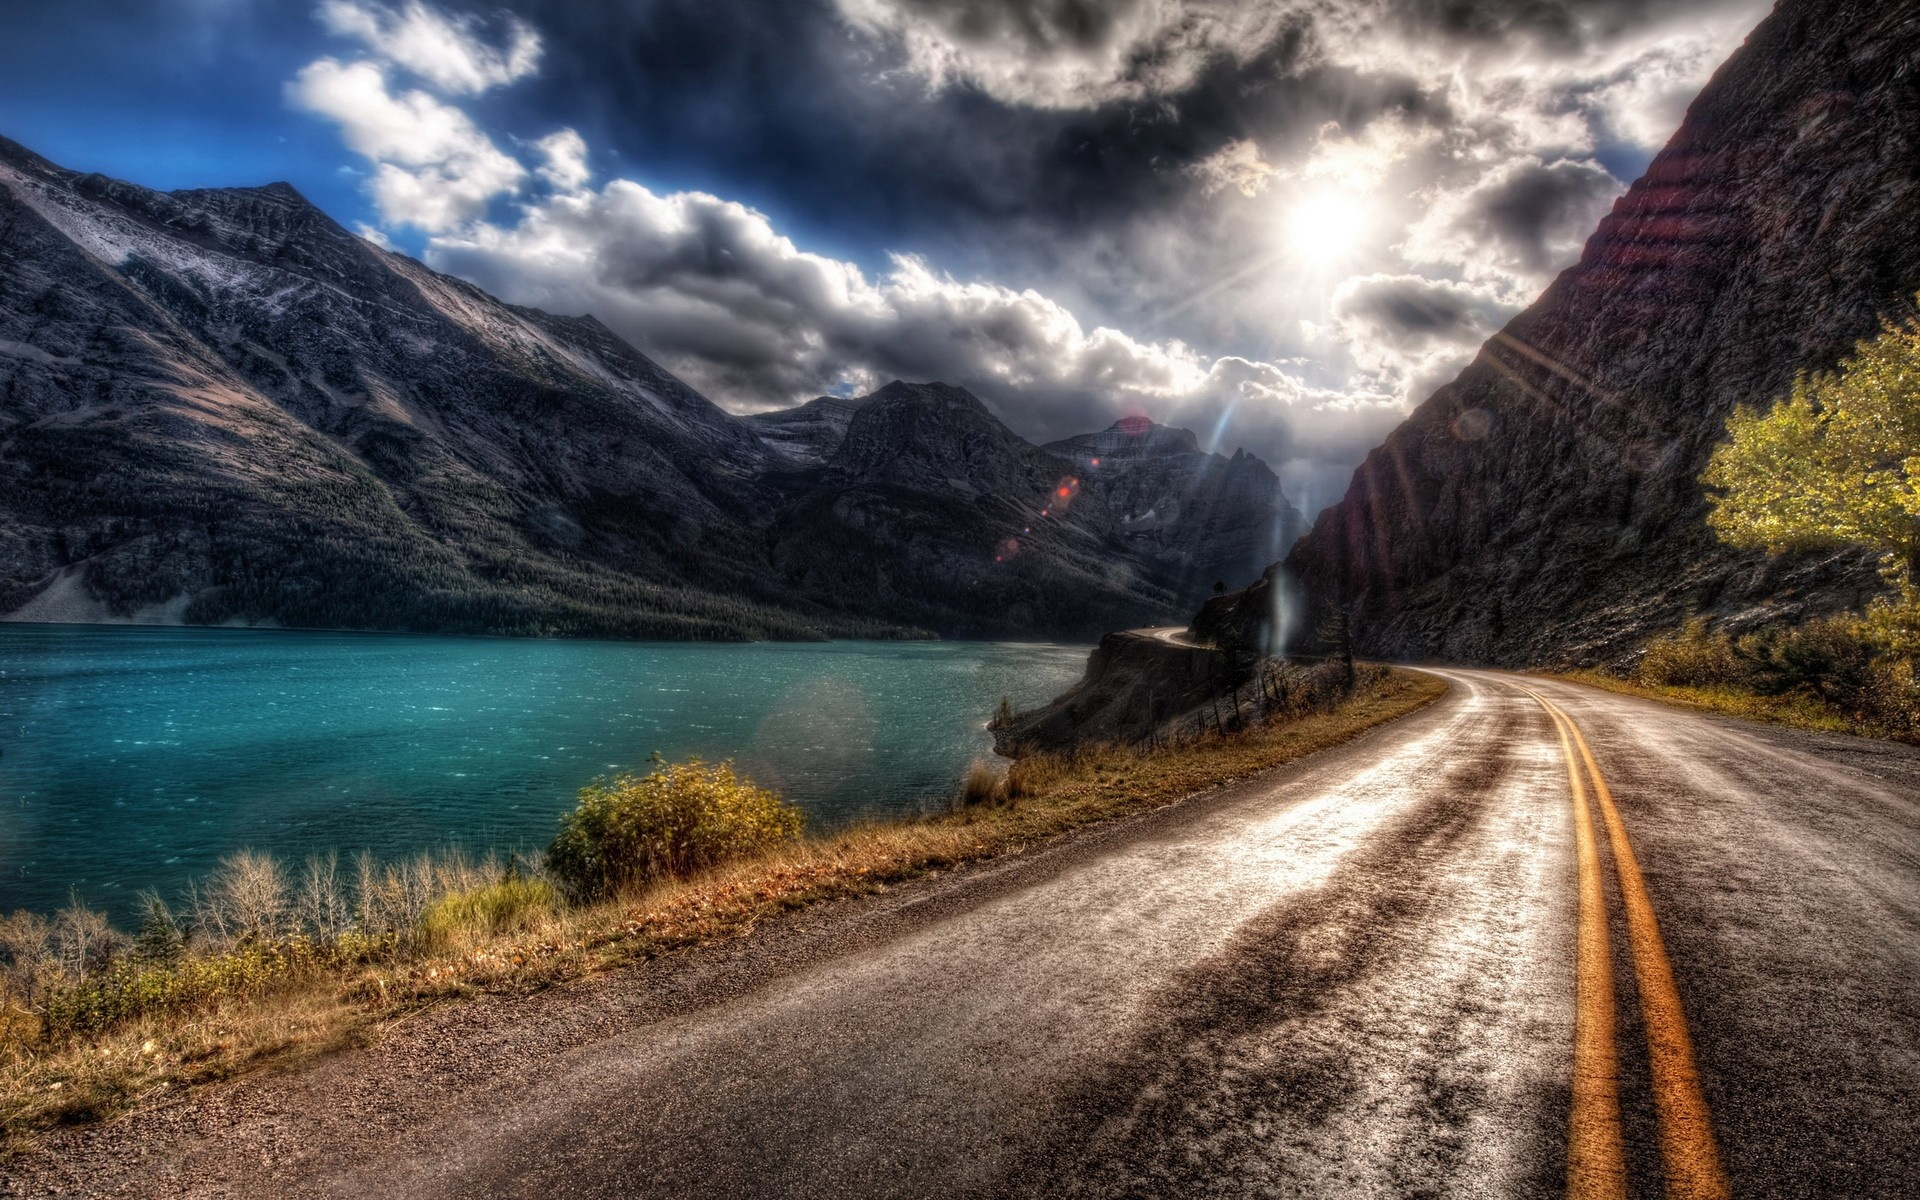 Mountain Road Wallpaper HD